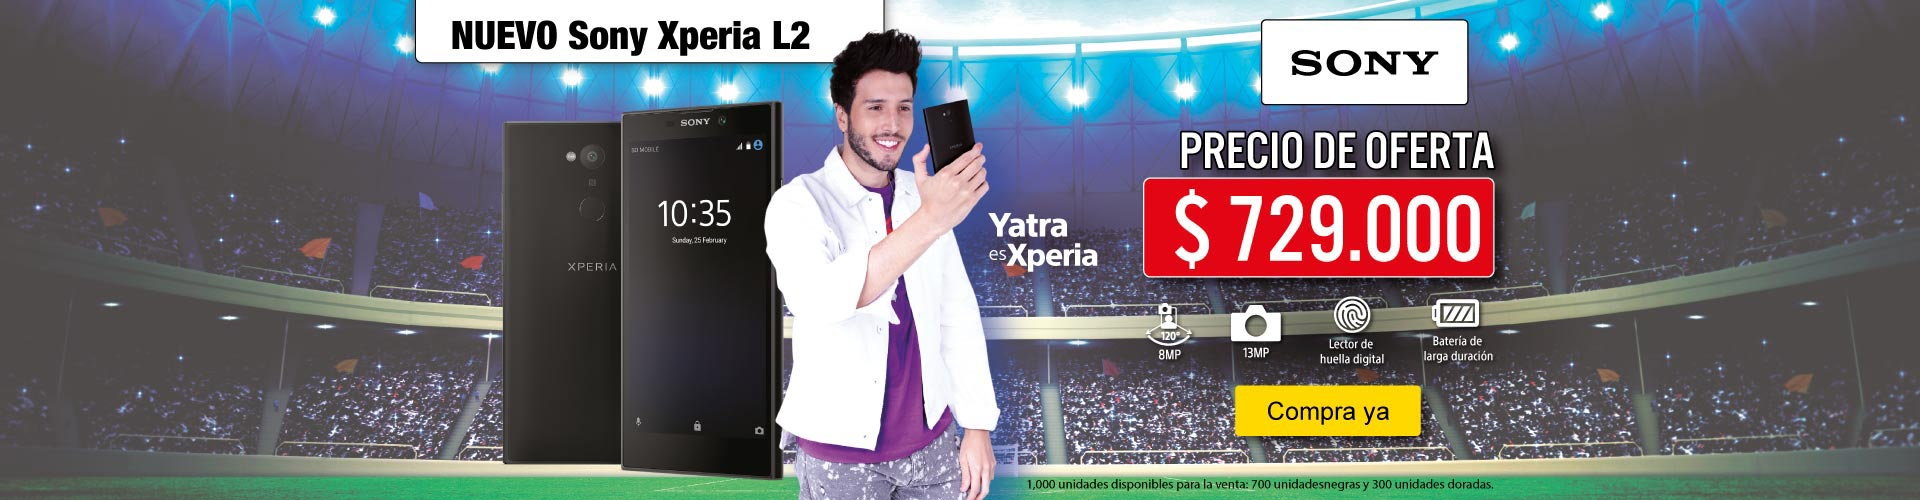 KT-PPAL-10-celulares-LNZ-EXPM-Sony-L2-Yatra-May26